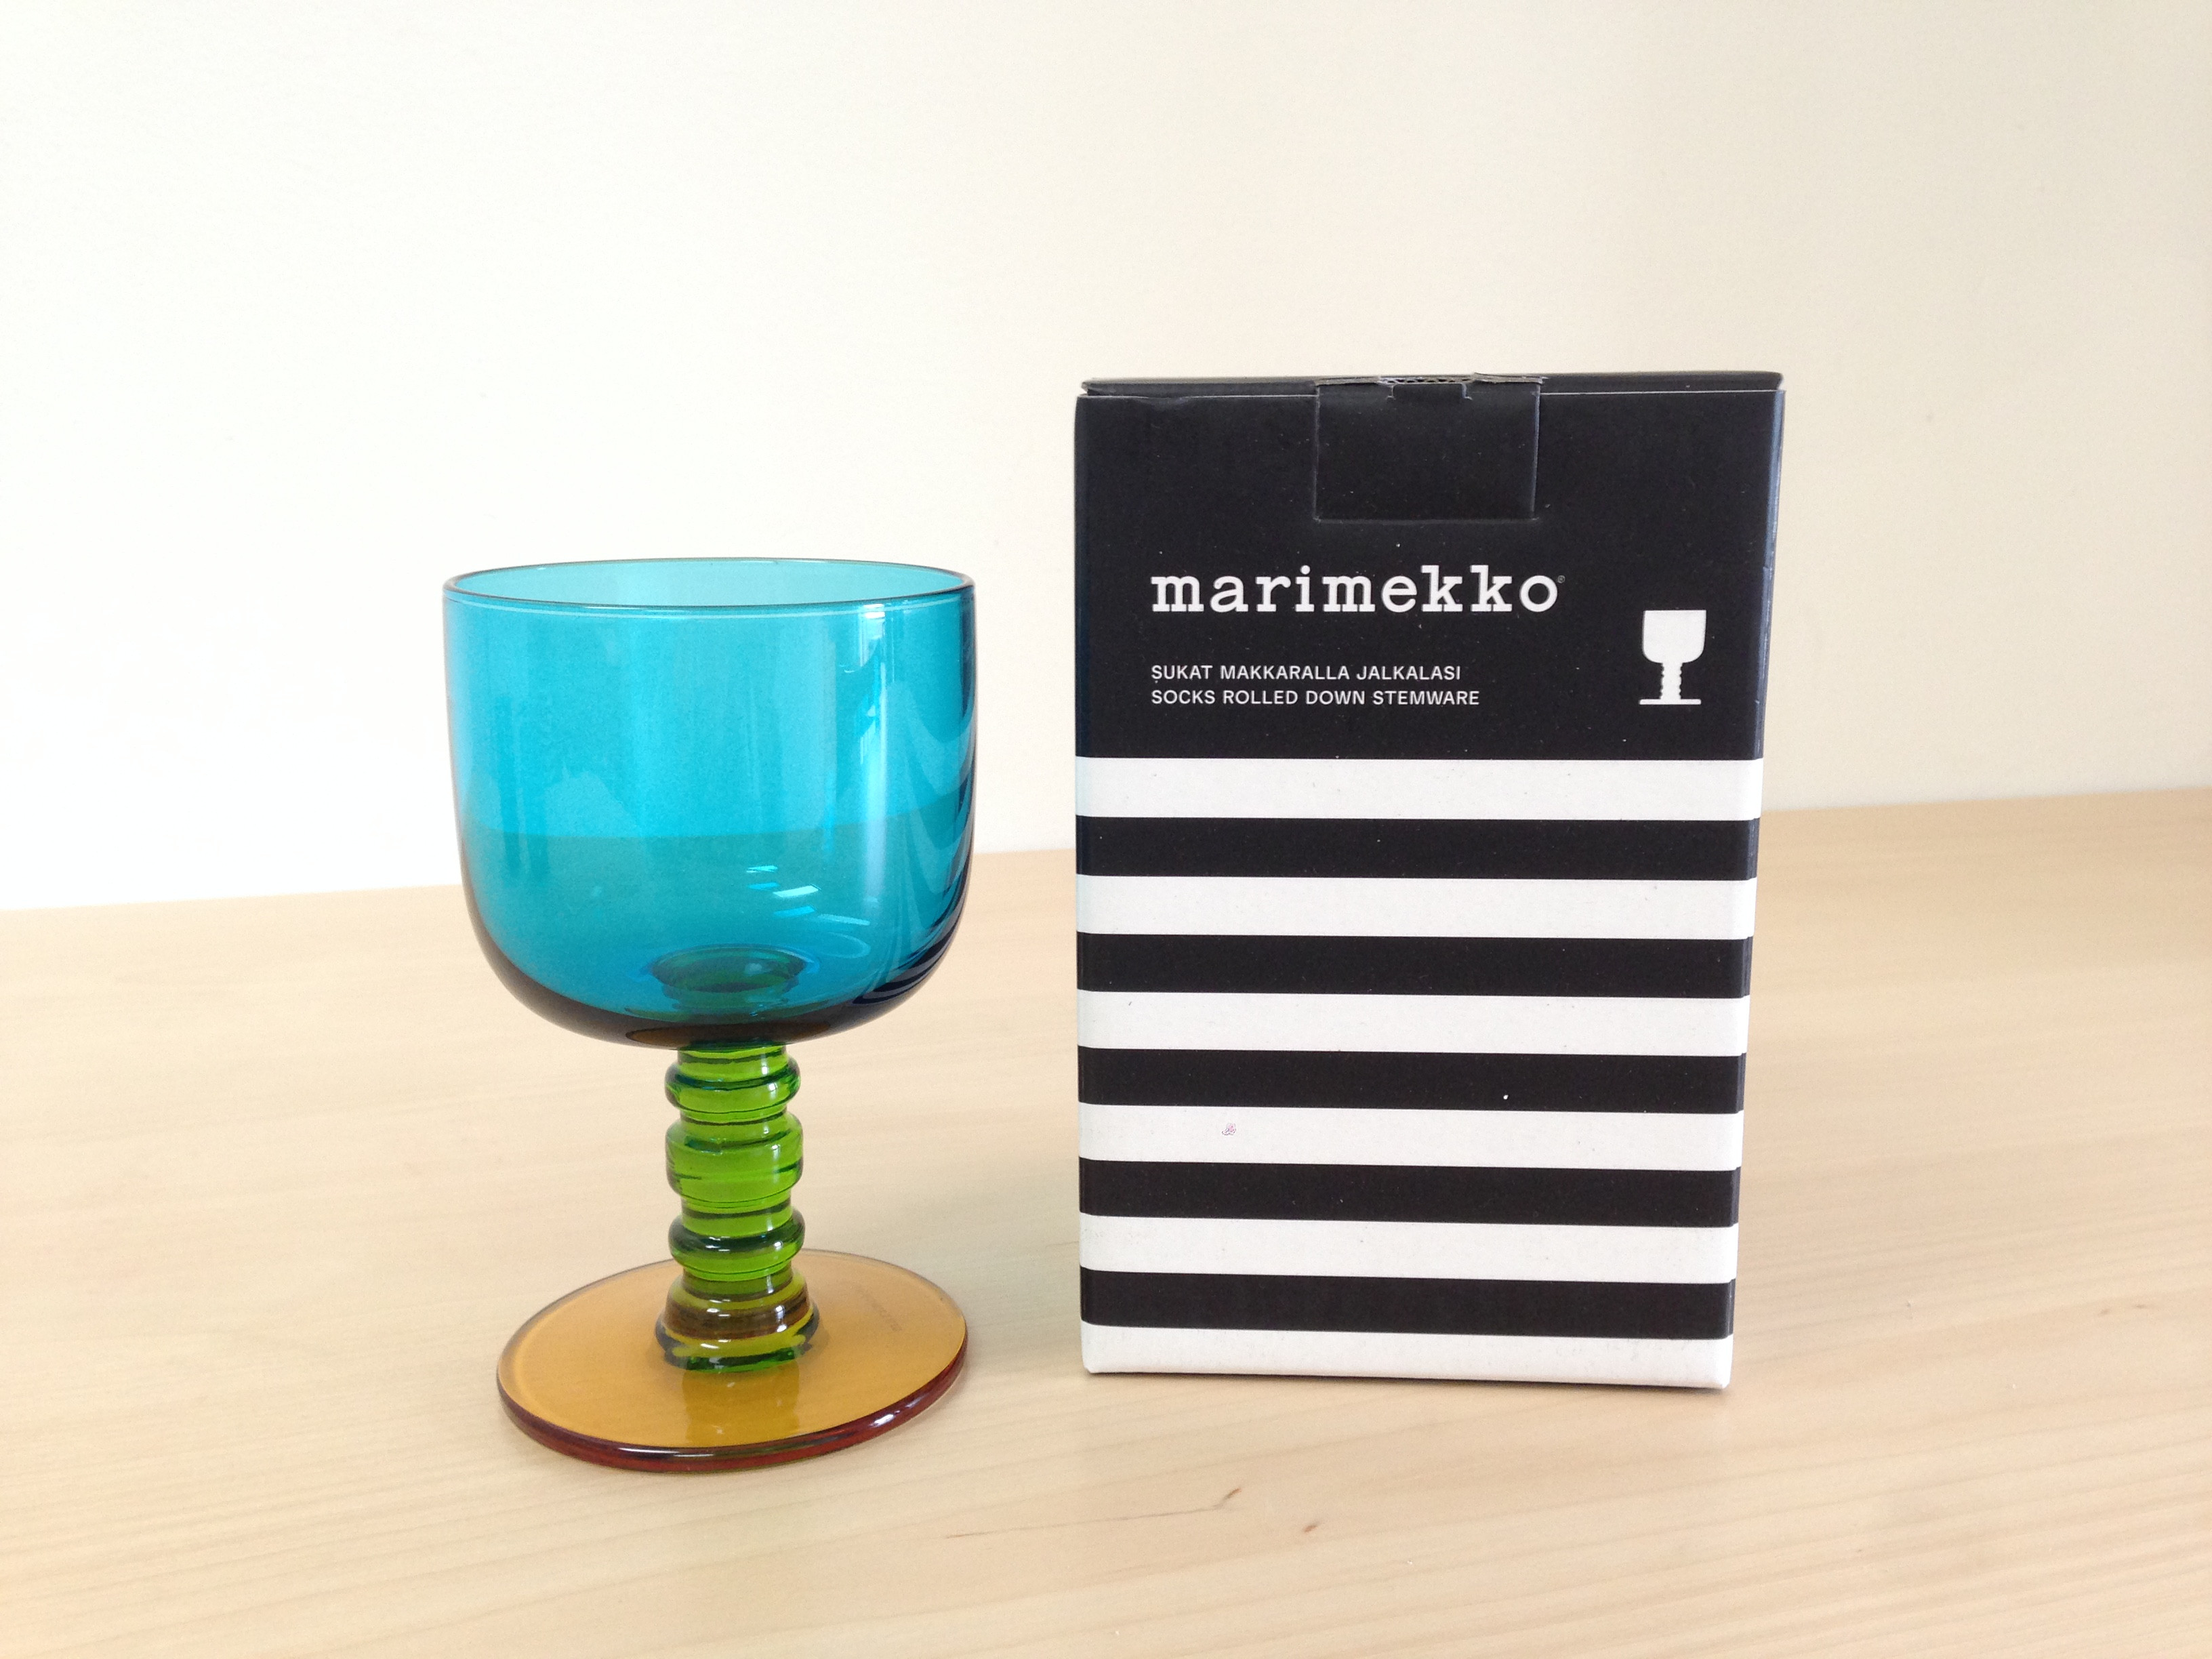 Marimekko Socks Rolled Down Stemware